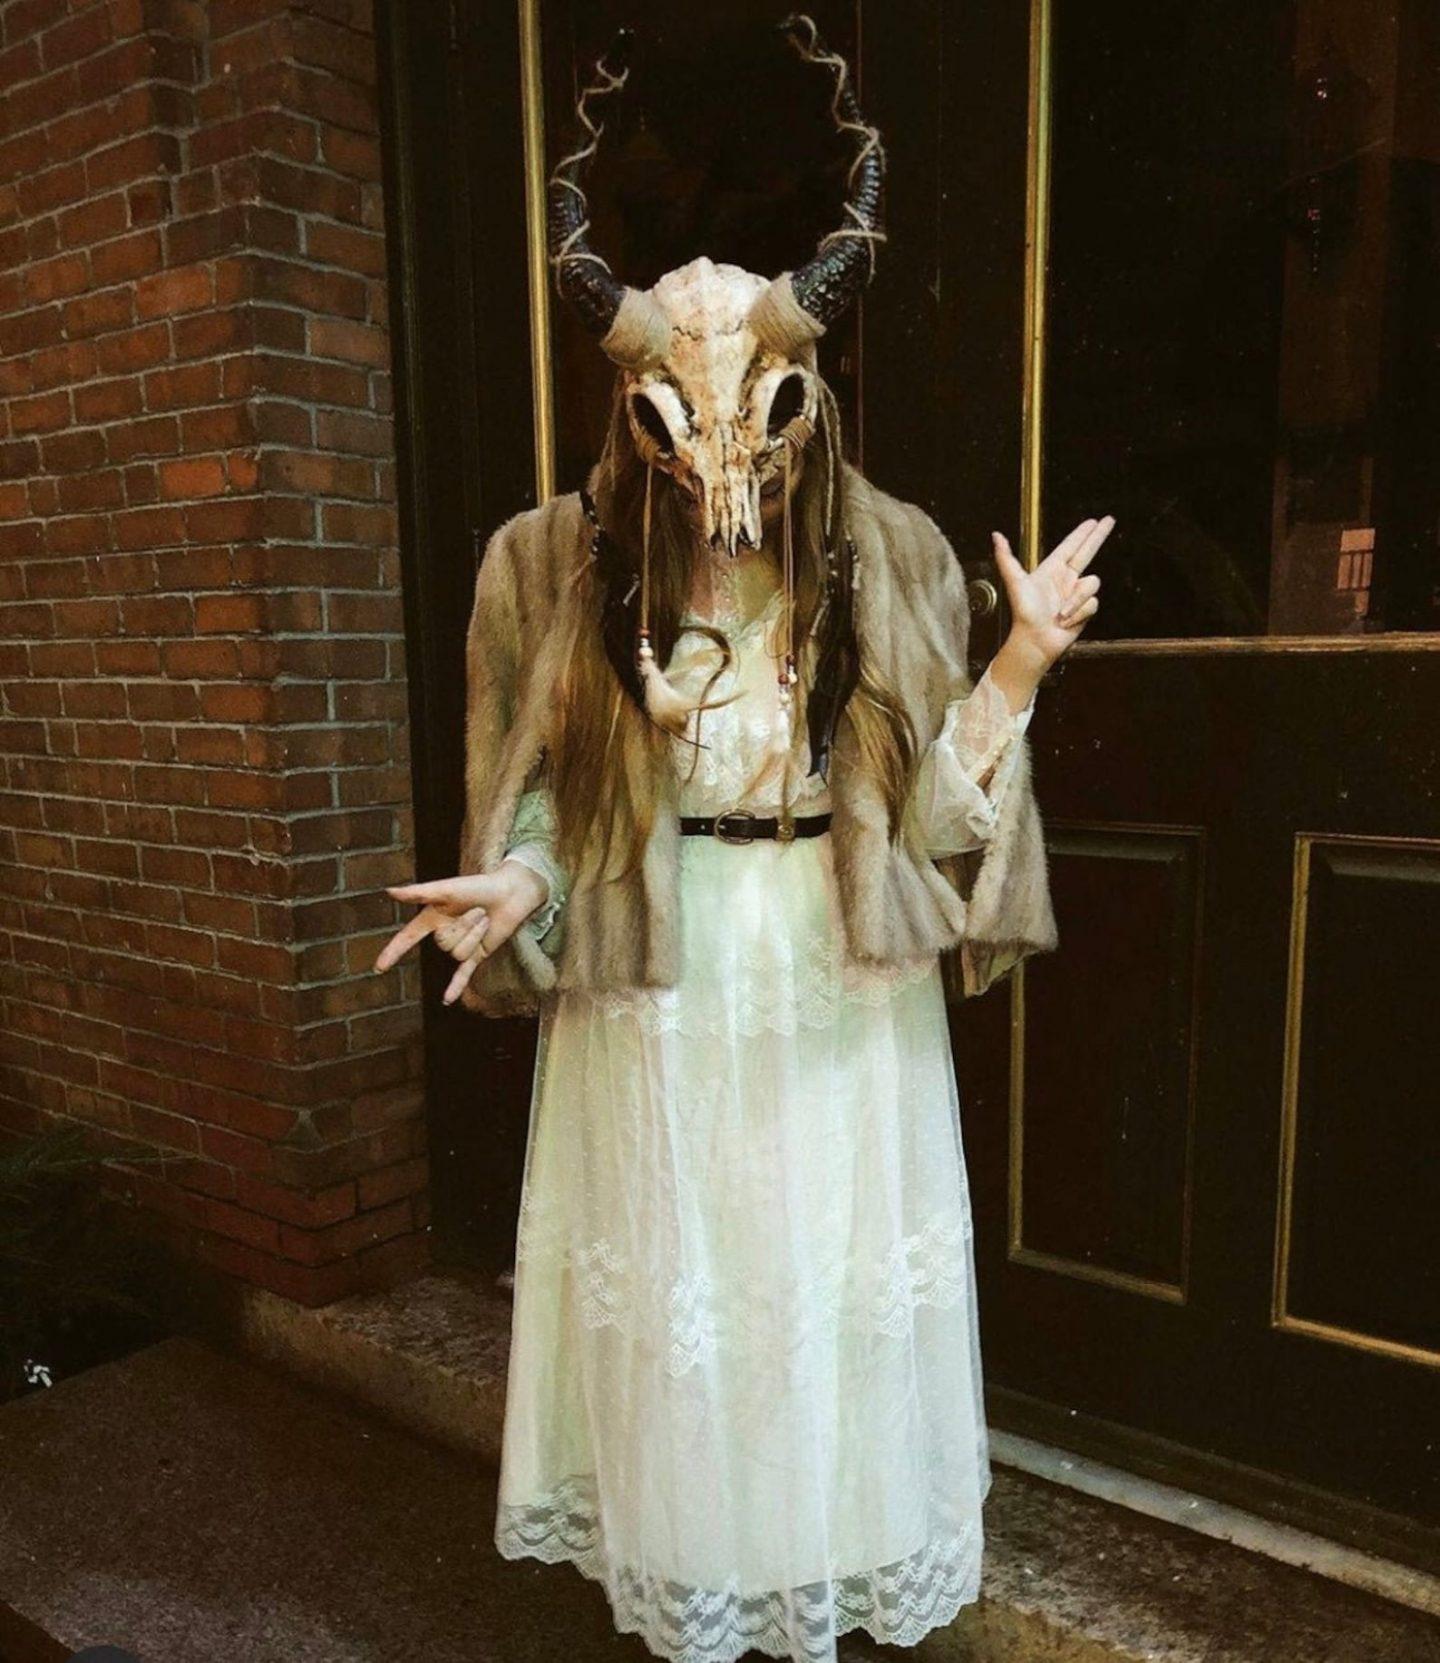 Scary pagan shaman Halloween costume for women